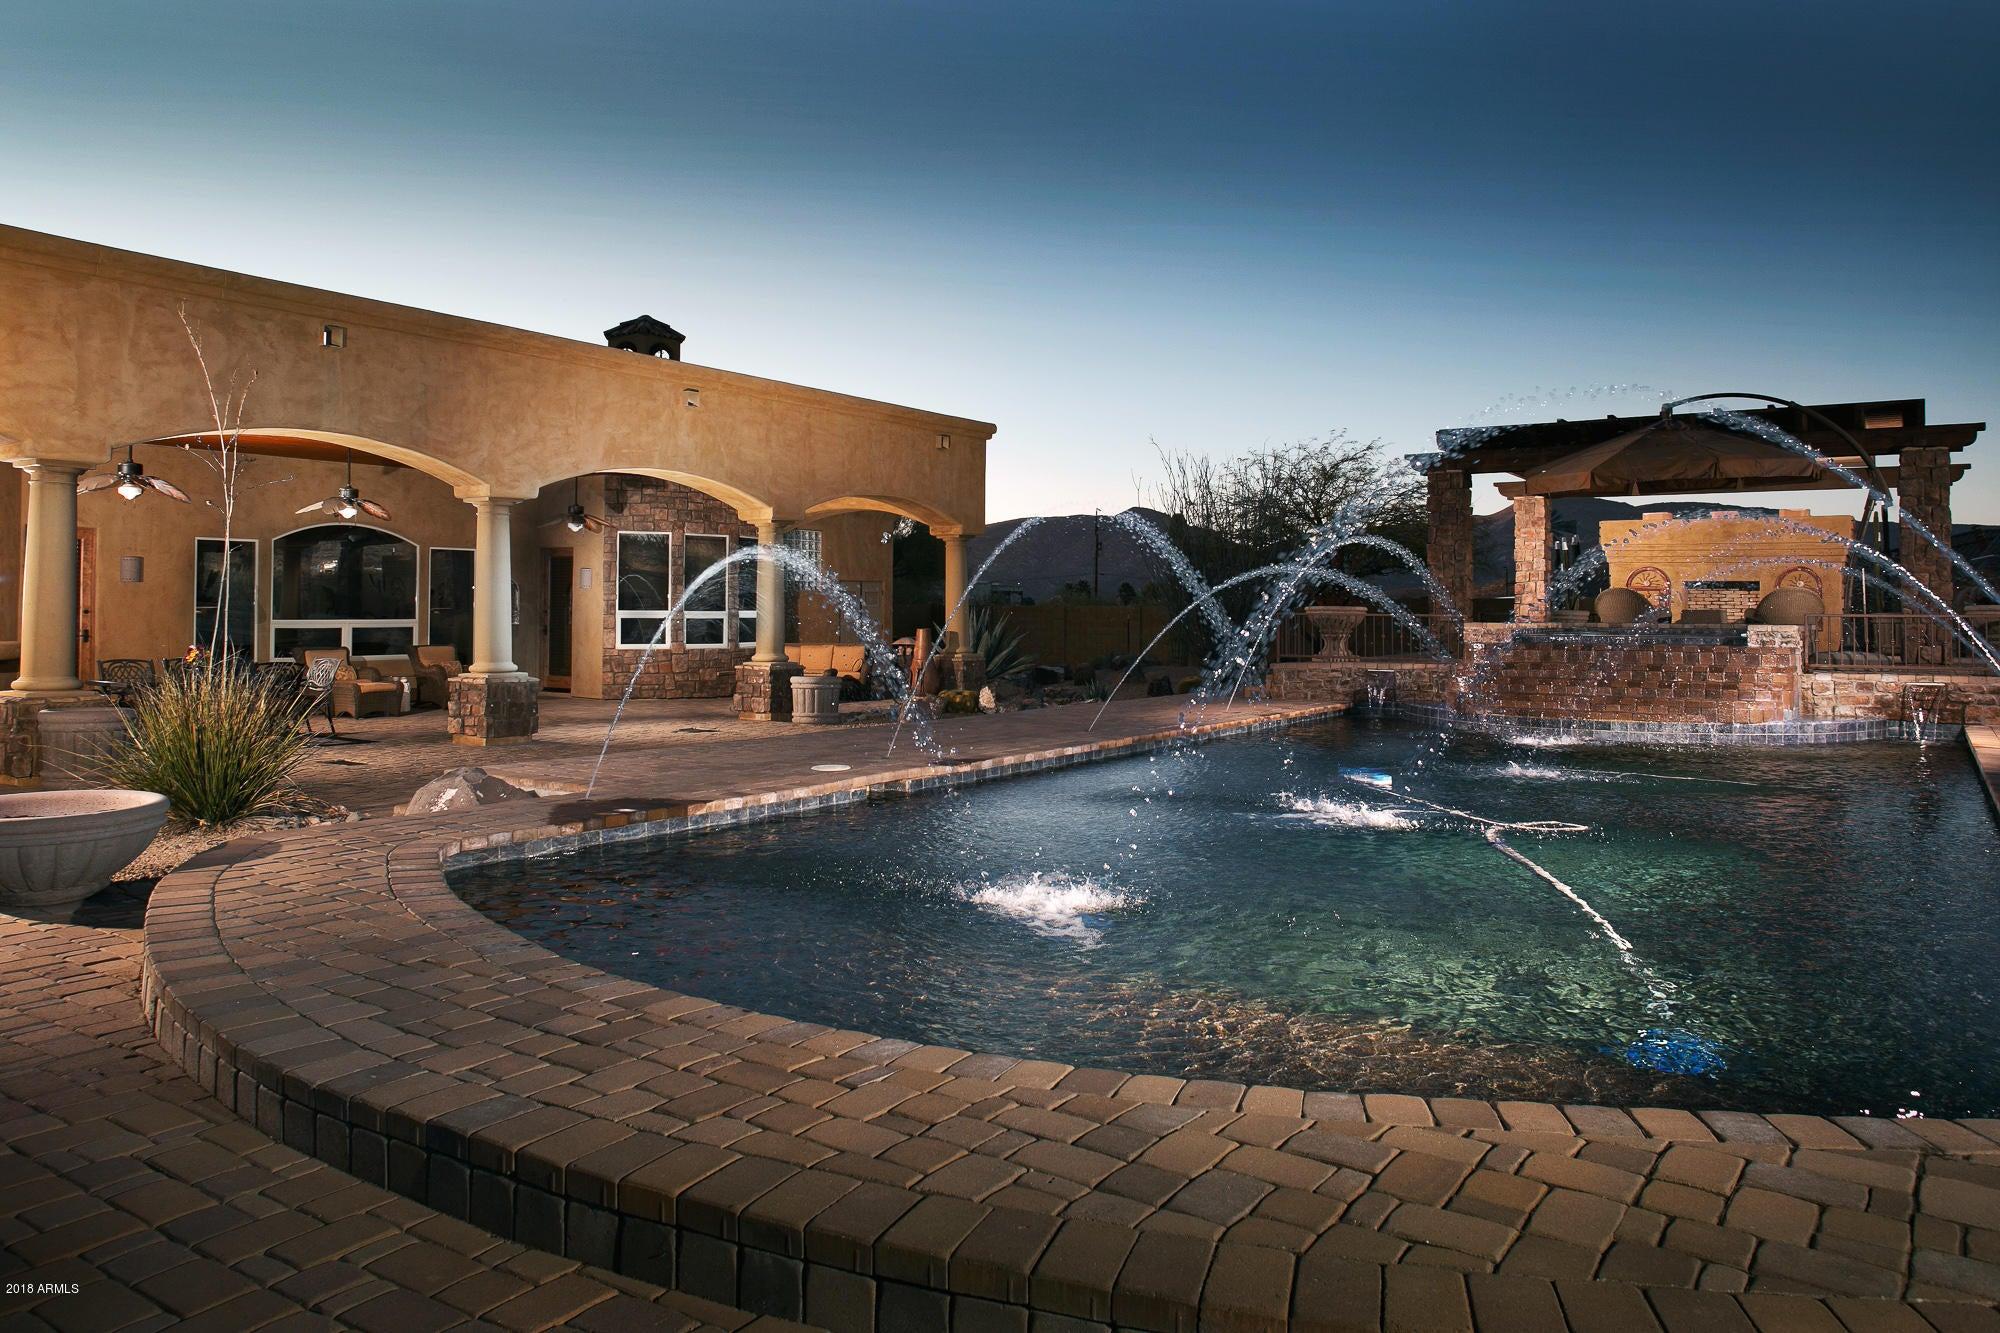 MLS 5732693 40409 N ECHO CANYON Drive, Cave Creek, AZ 85331 Cave Creek AZ Four Bedroom